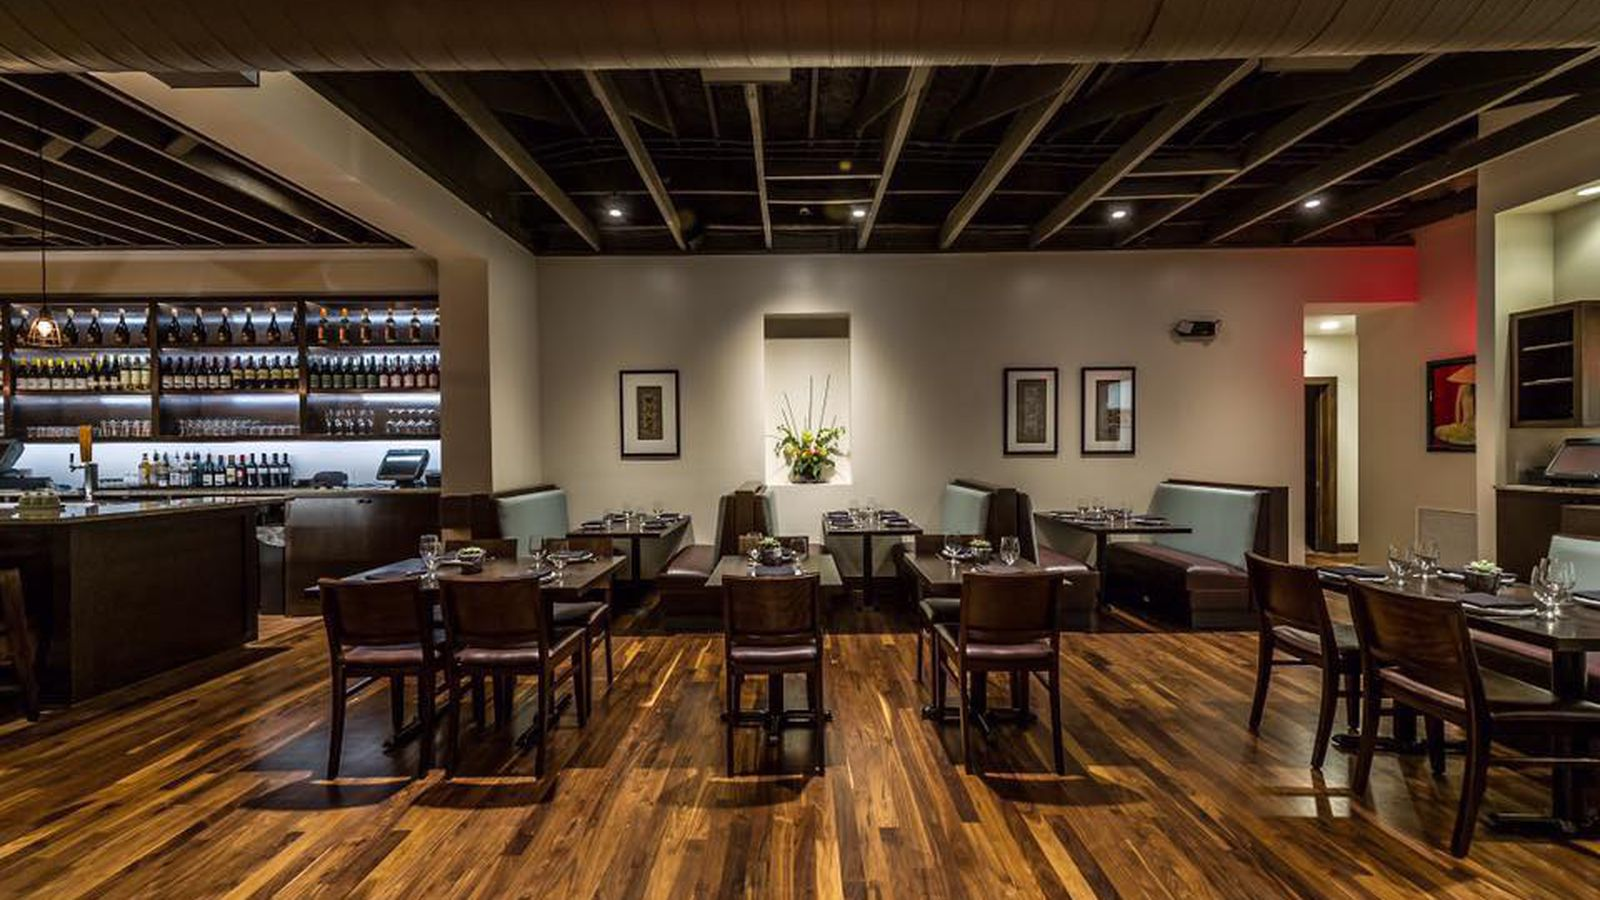 Lotus Vietnamese Cuisine Unlocked the Doors Yesterday: Here's the Menu